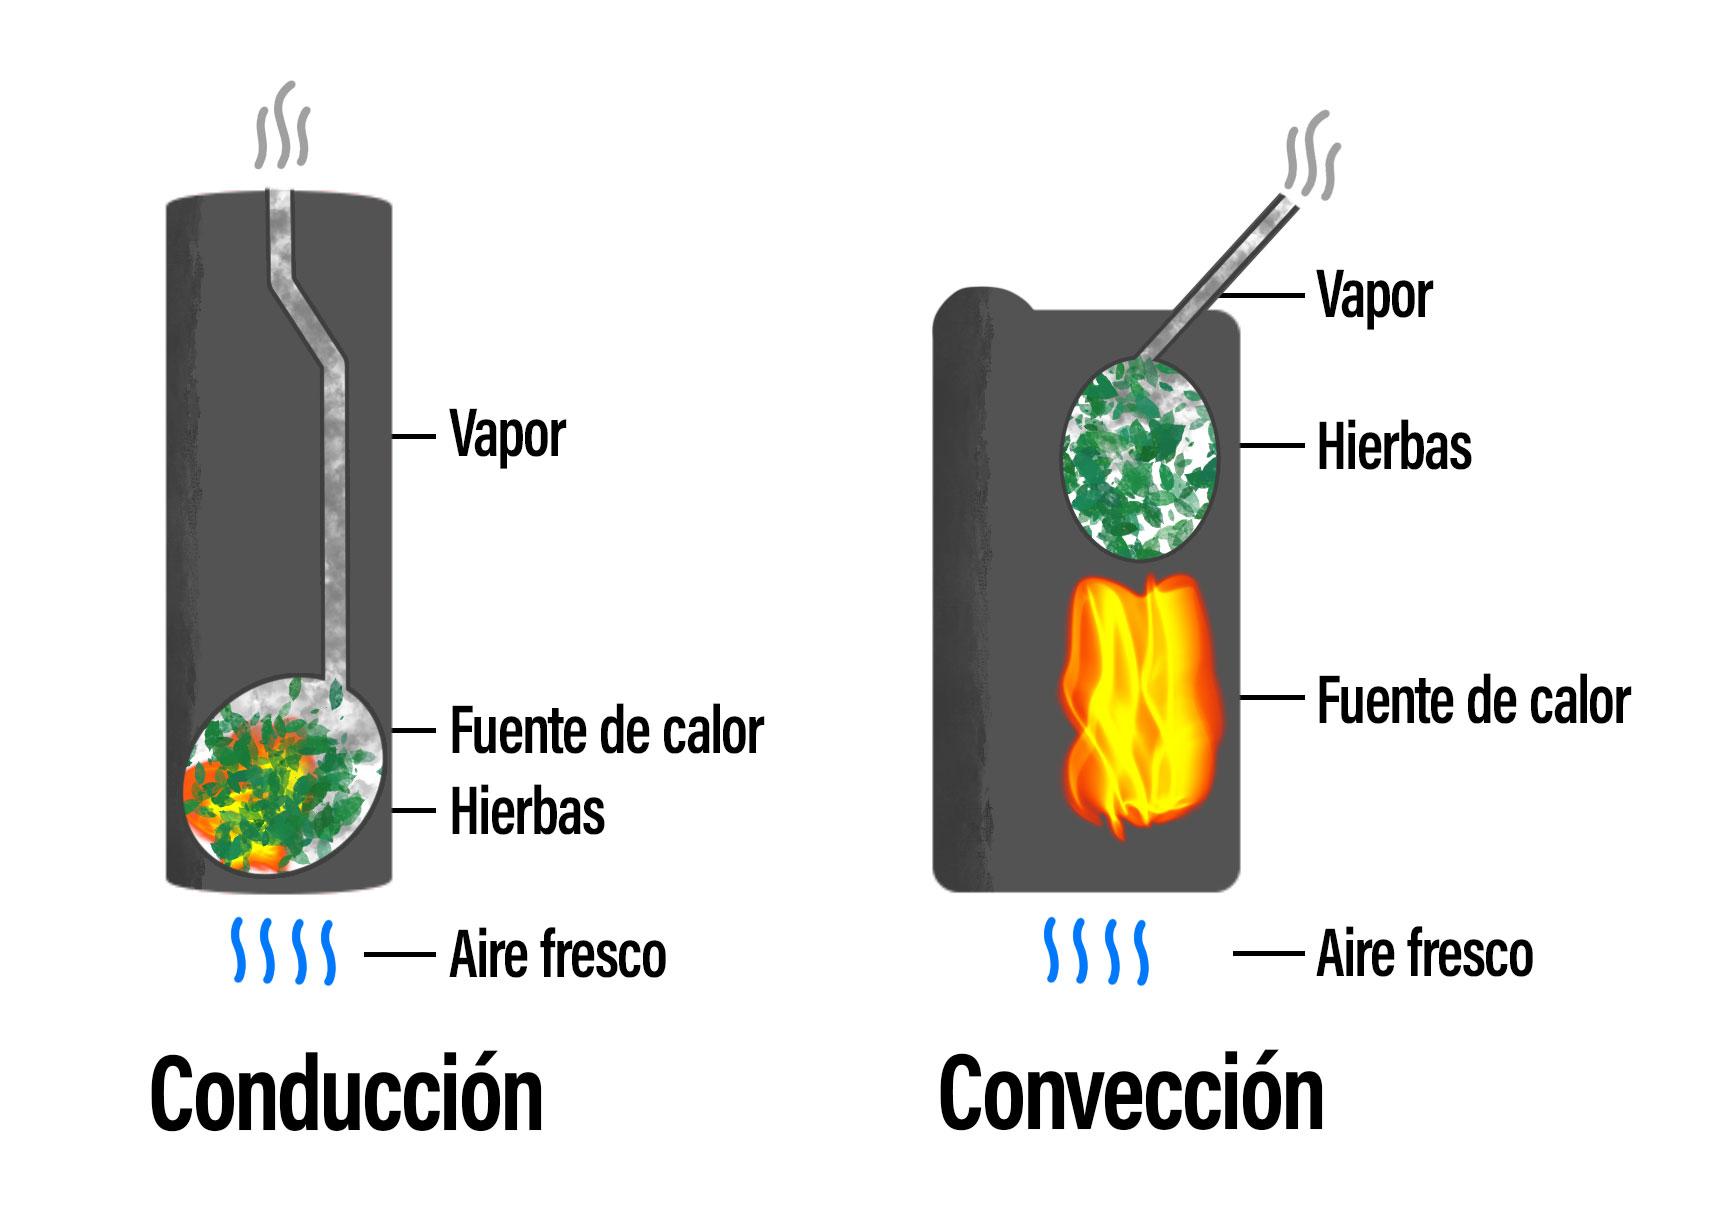 Vaporizador portatil conveccion conduccion